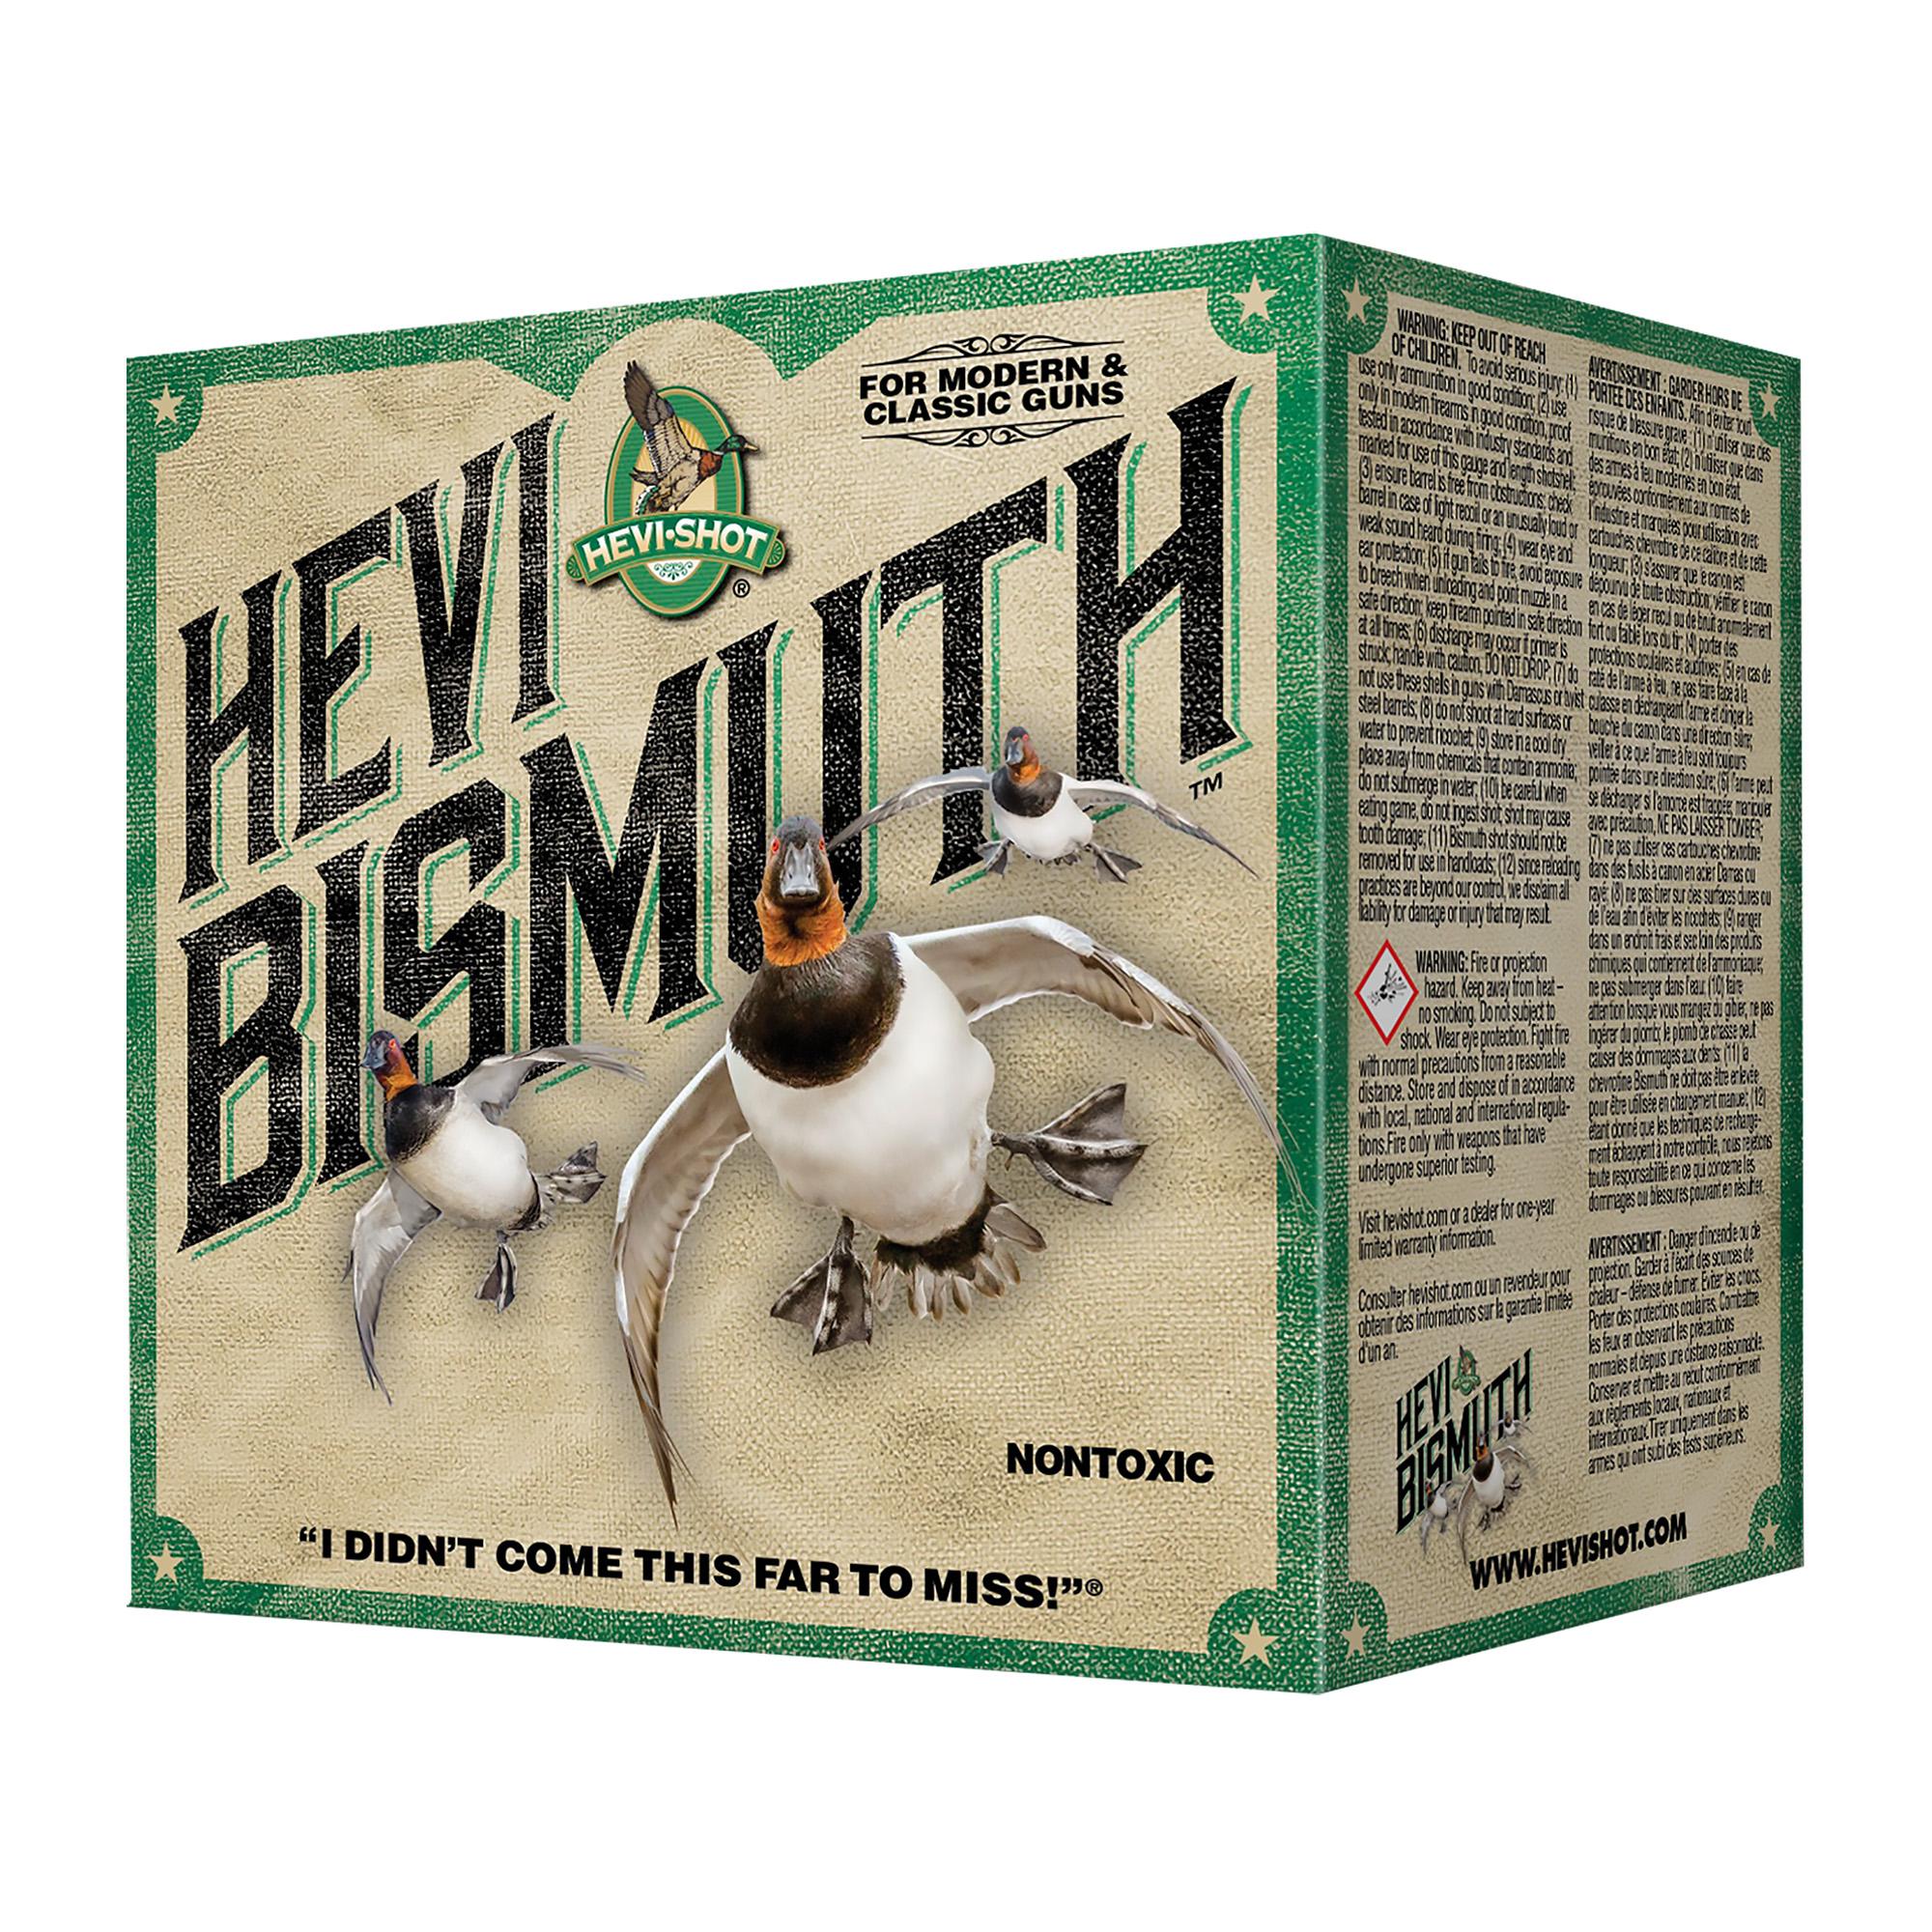 "Hevi Bismuth 20ga 3"" #2 25/250"